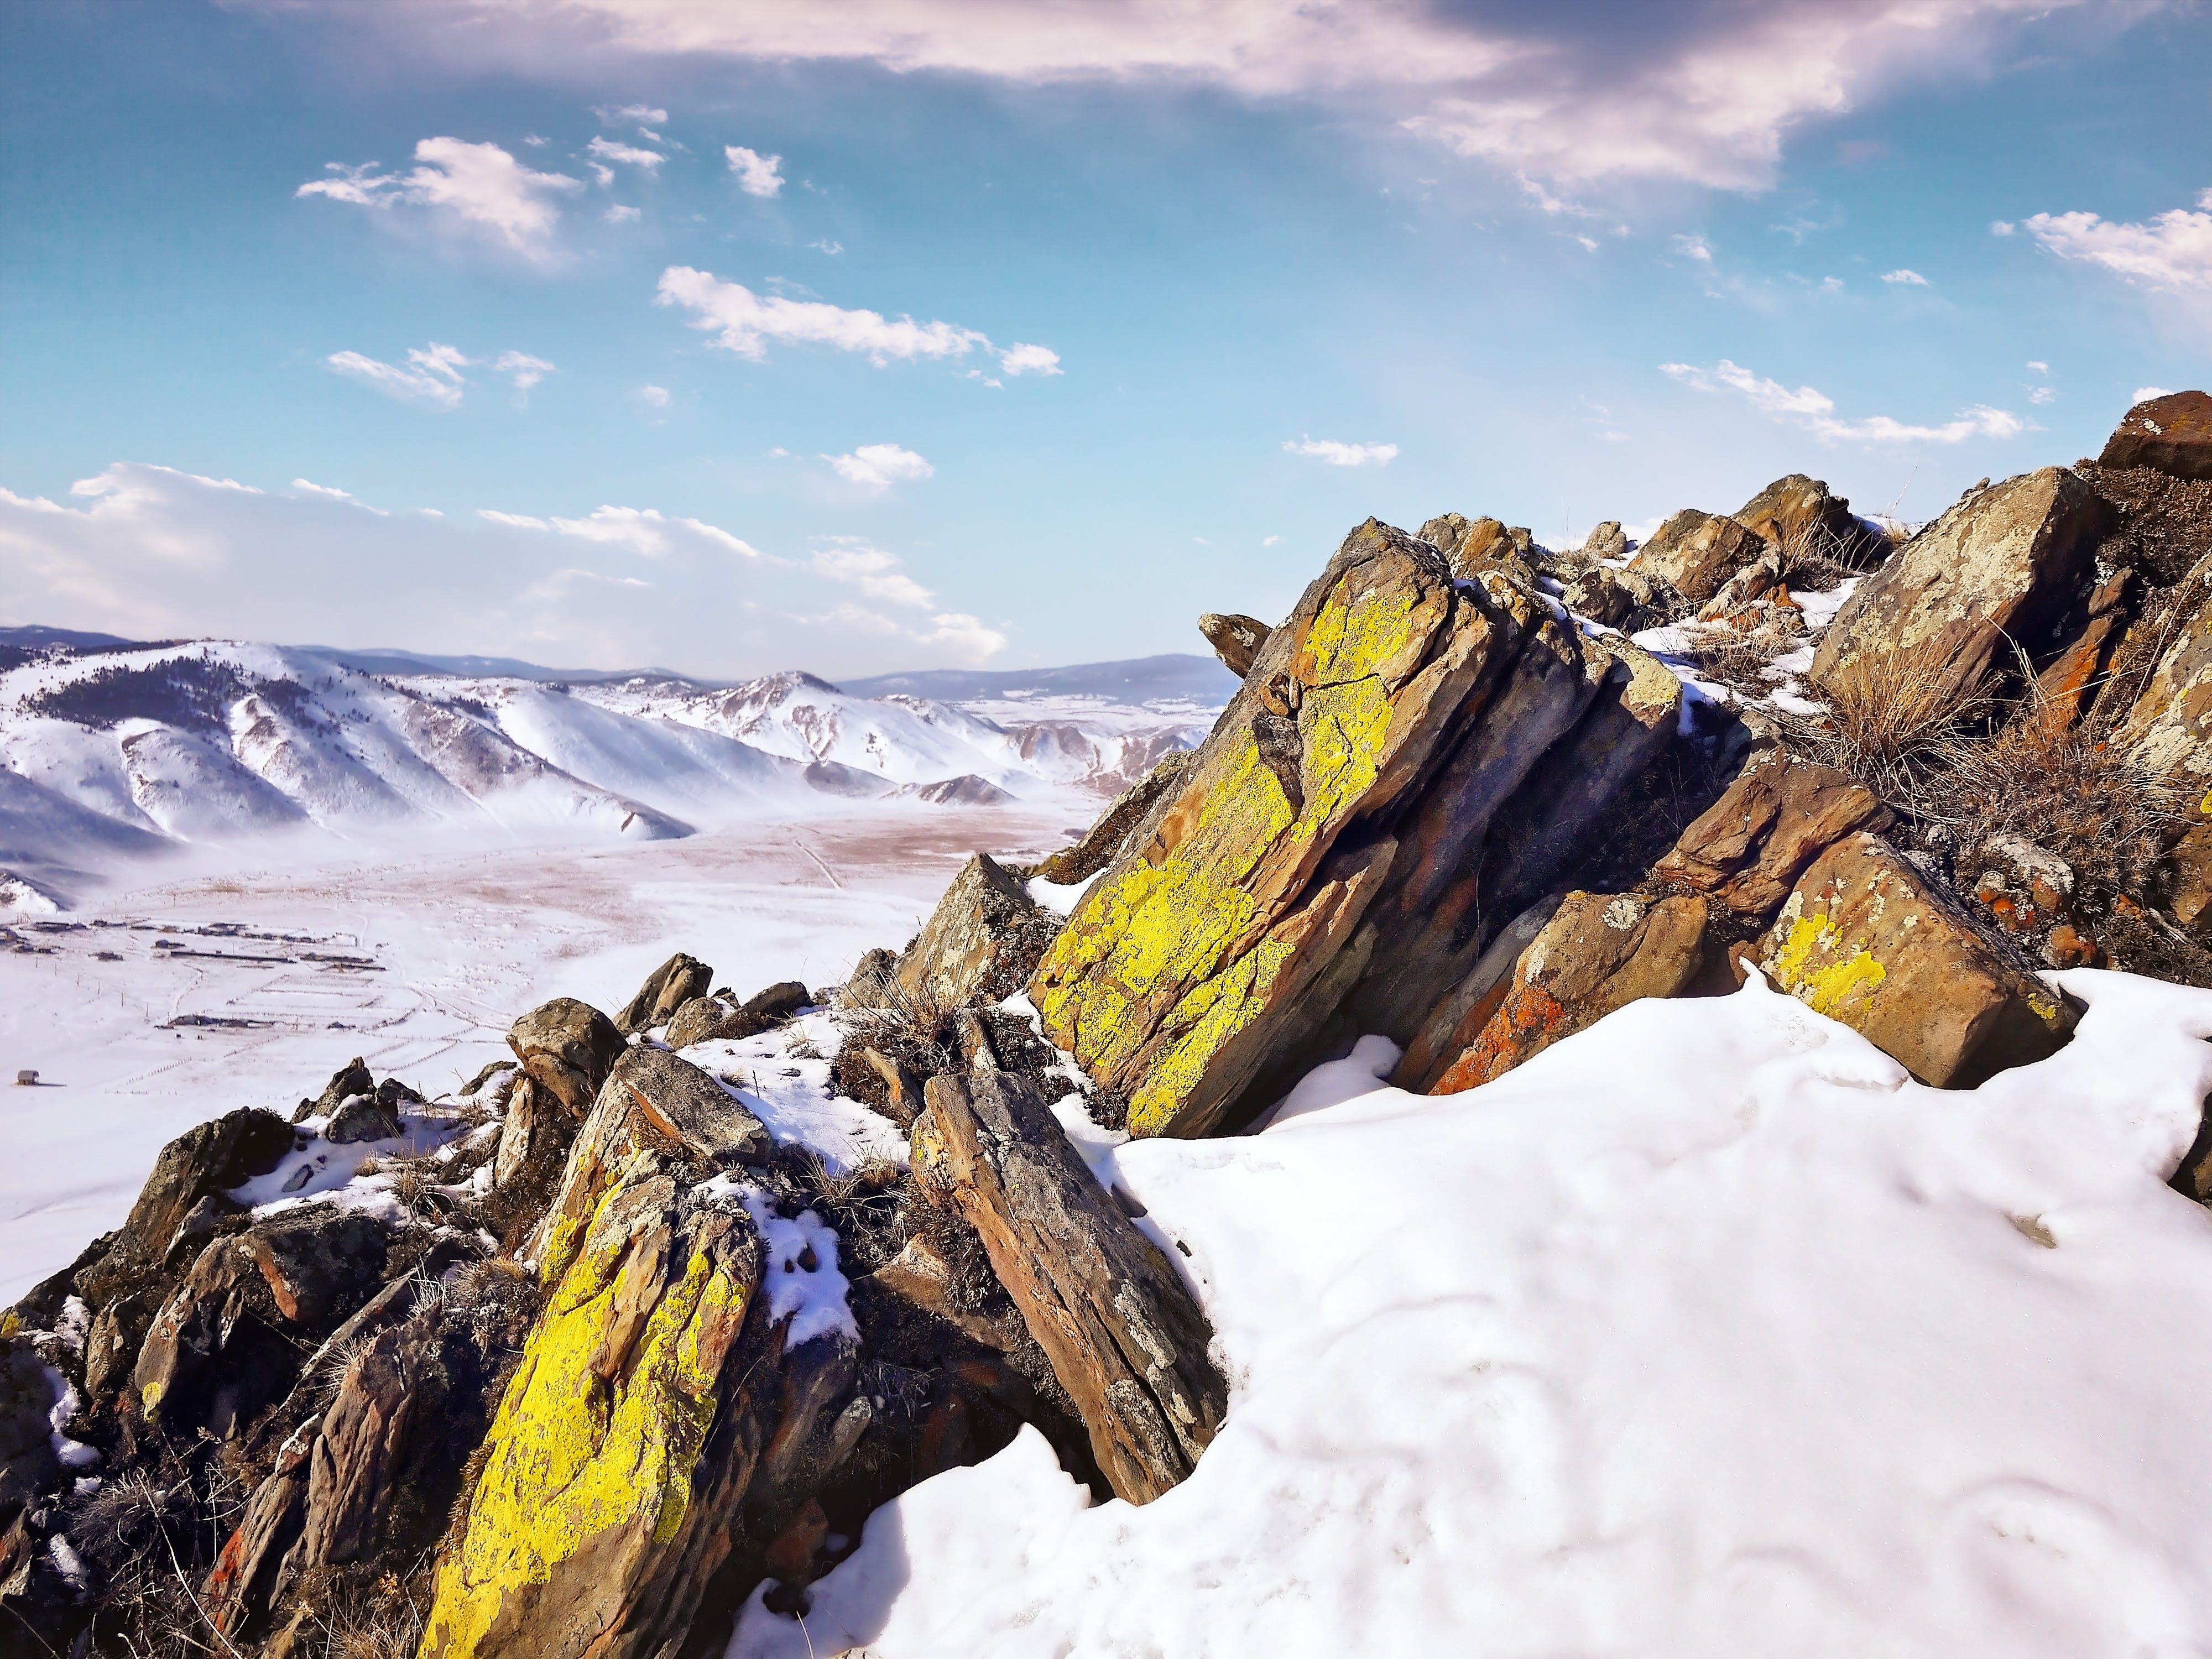 White and Brown Rocks On Snow Mountain